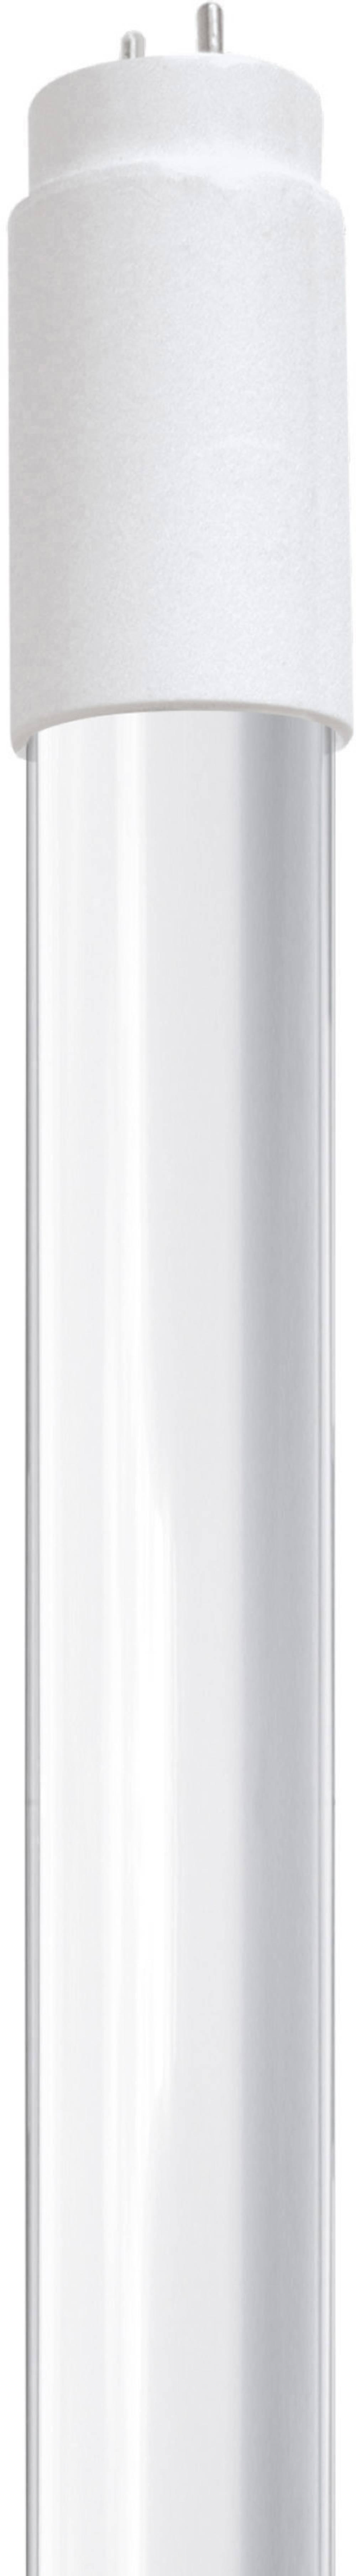 LED žarnica G13 oblika cevi 10 W topla bela (premer x D) 28 mm x 600 mm EEK: A+ Sygonix 1 kos